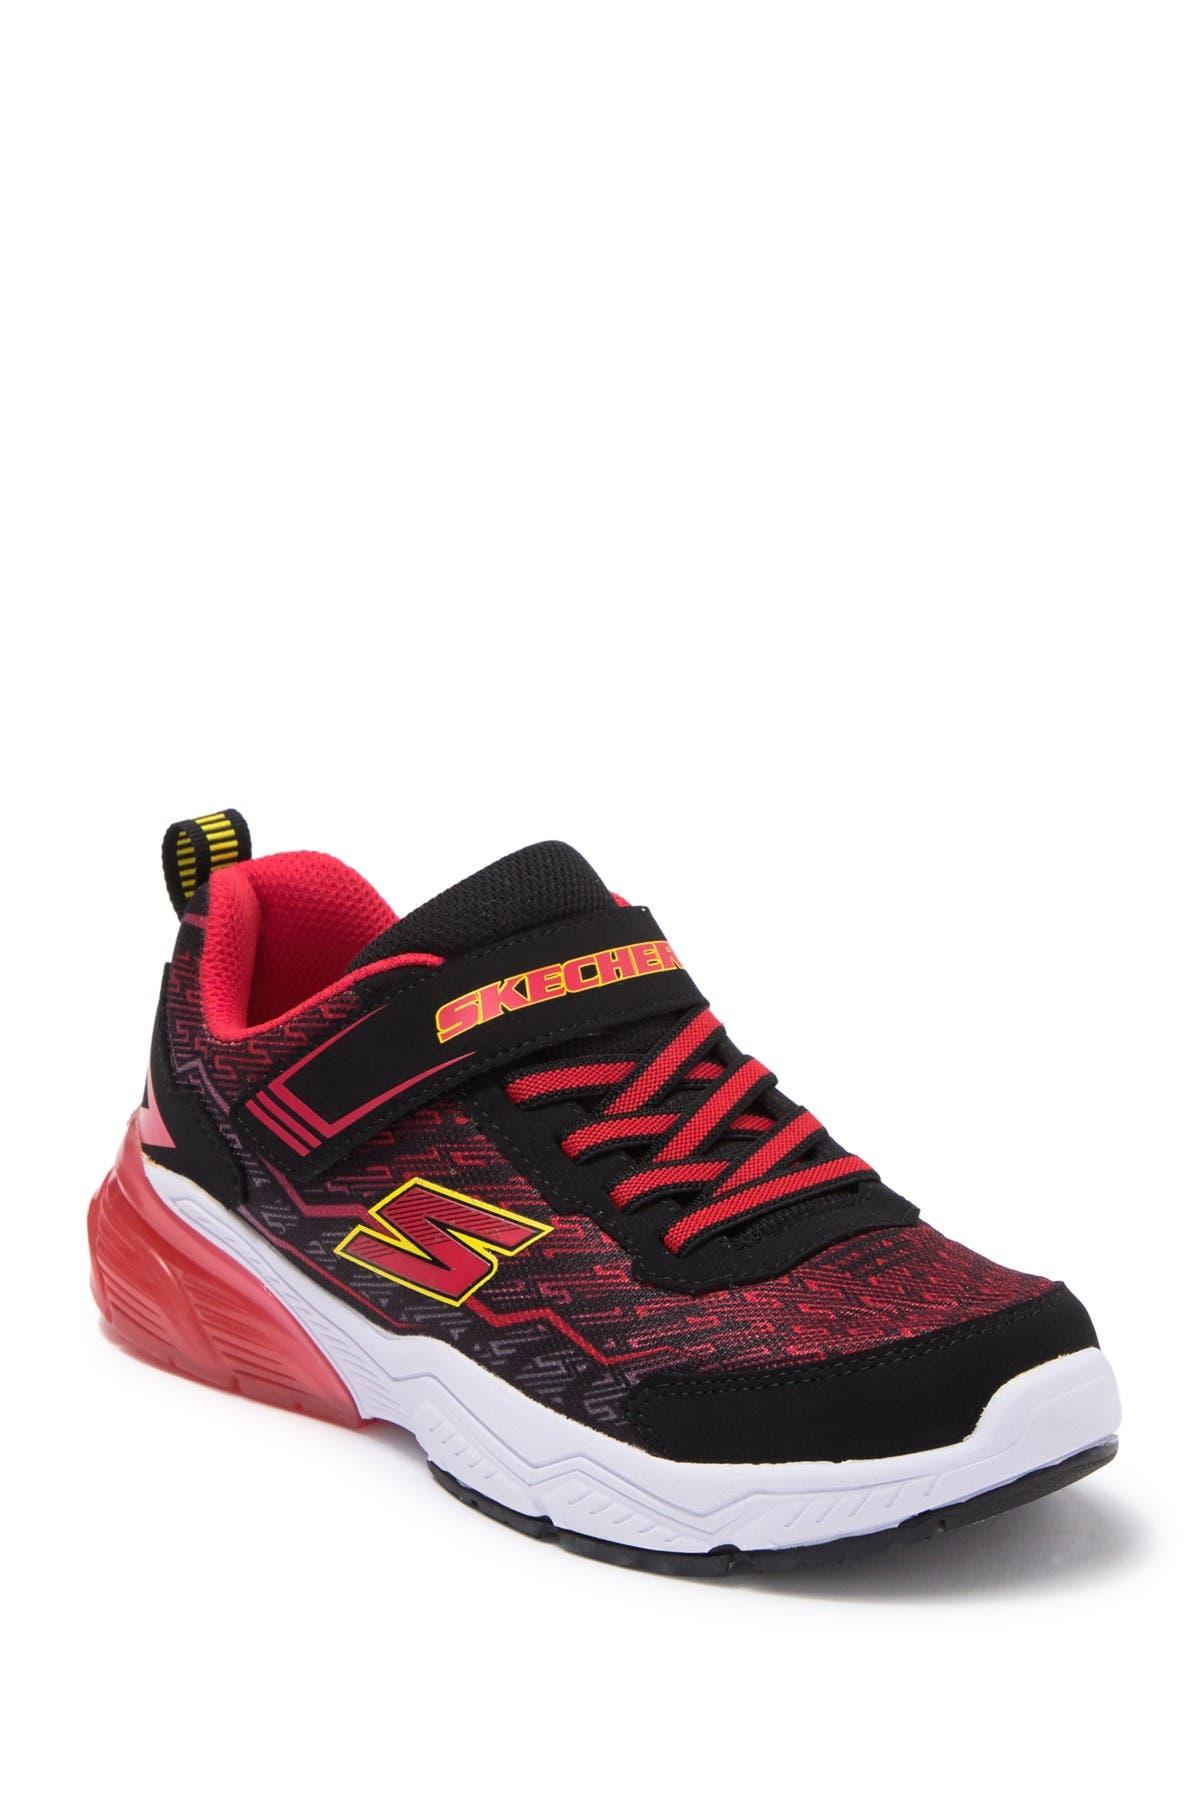 Image of Skechers Thermoflux 2.0 Sneaker